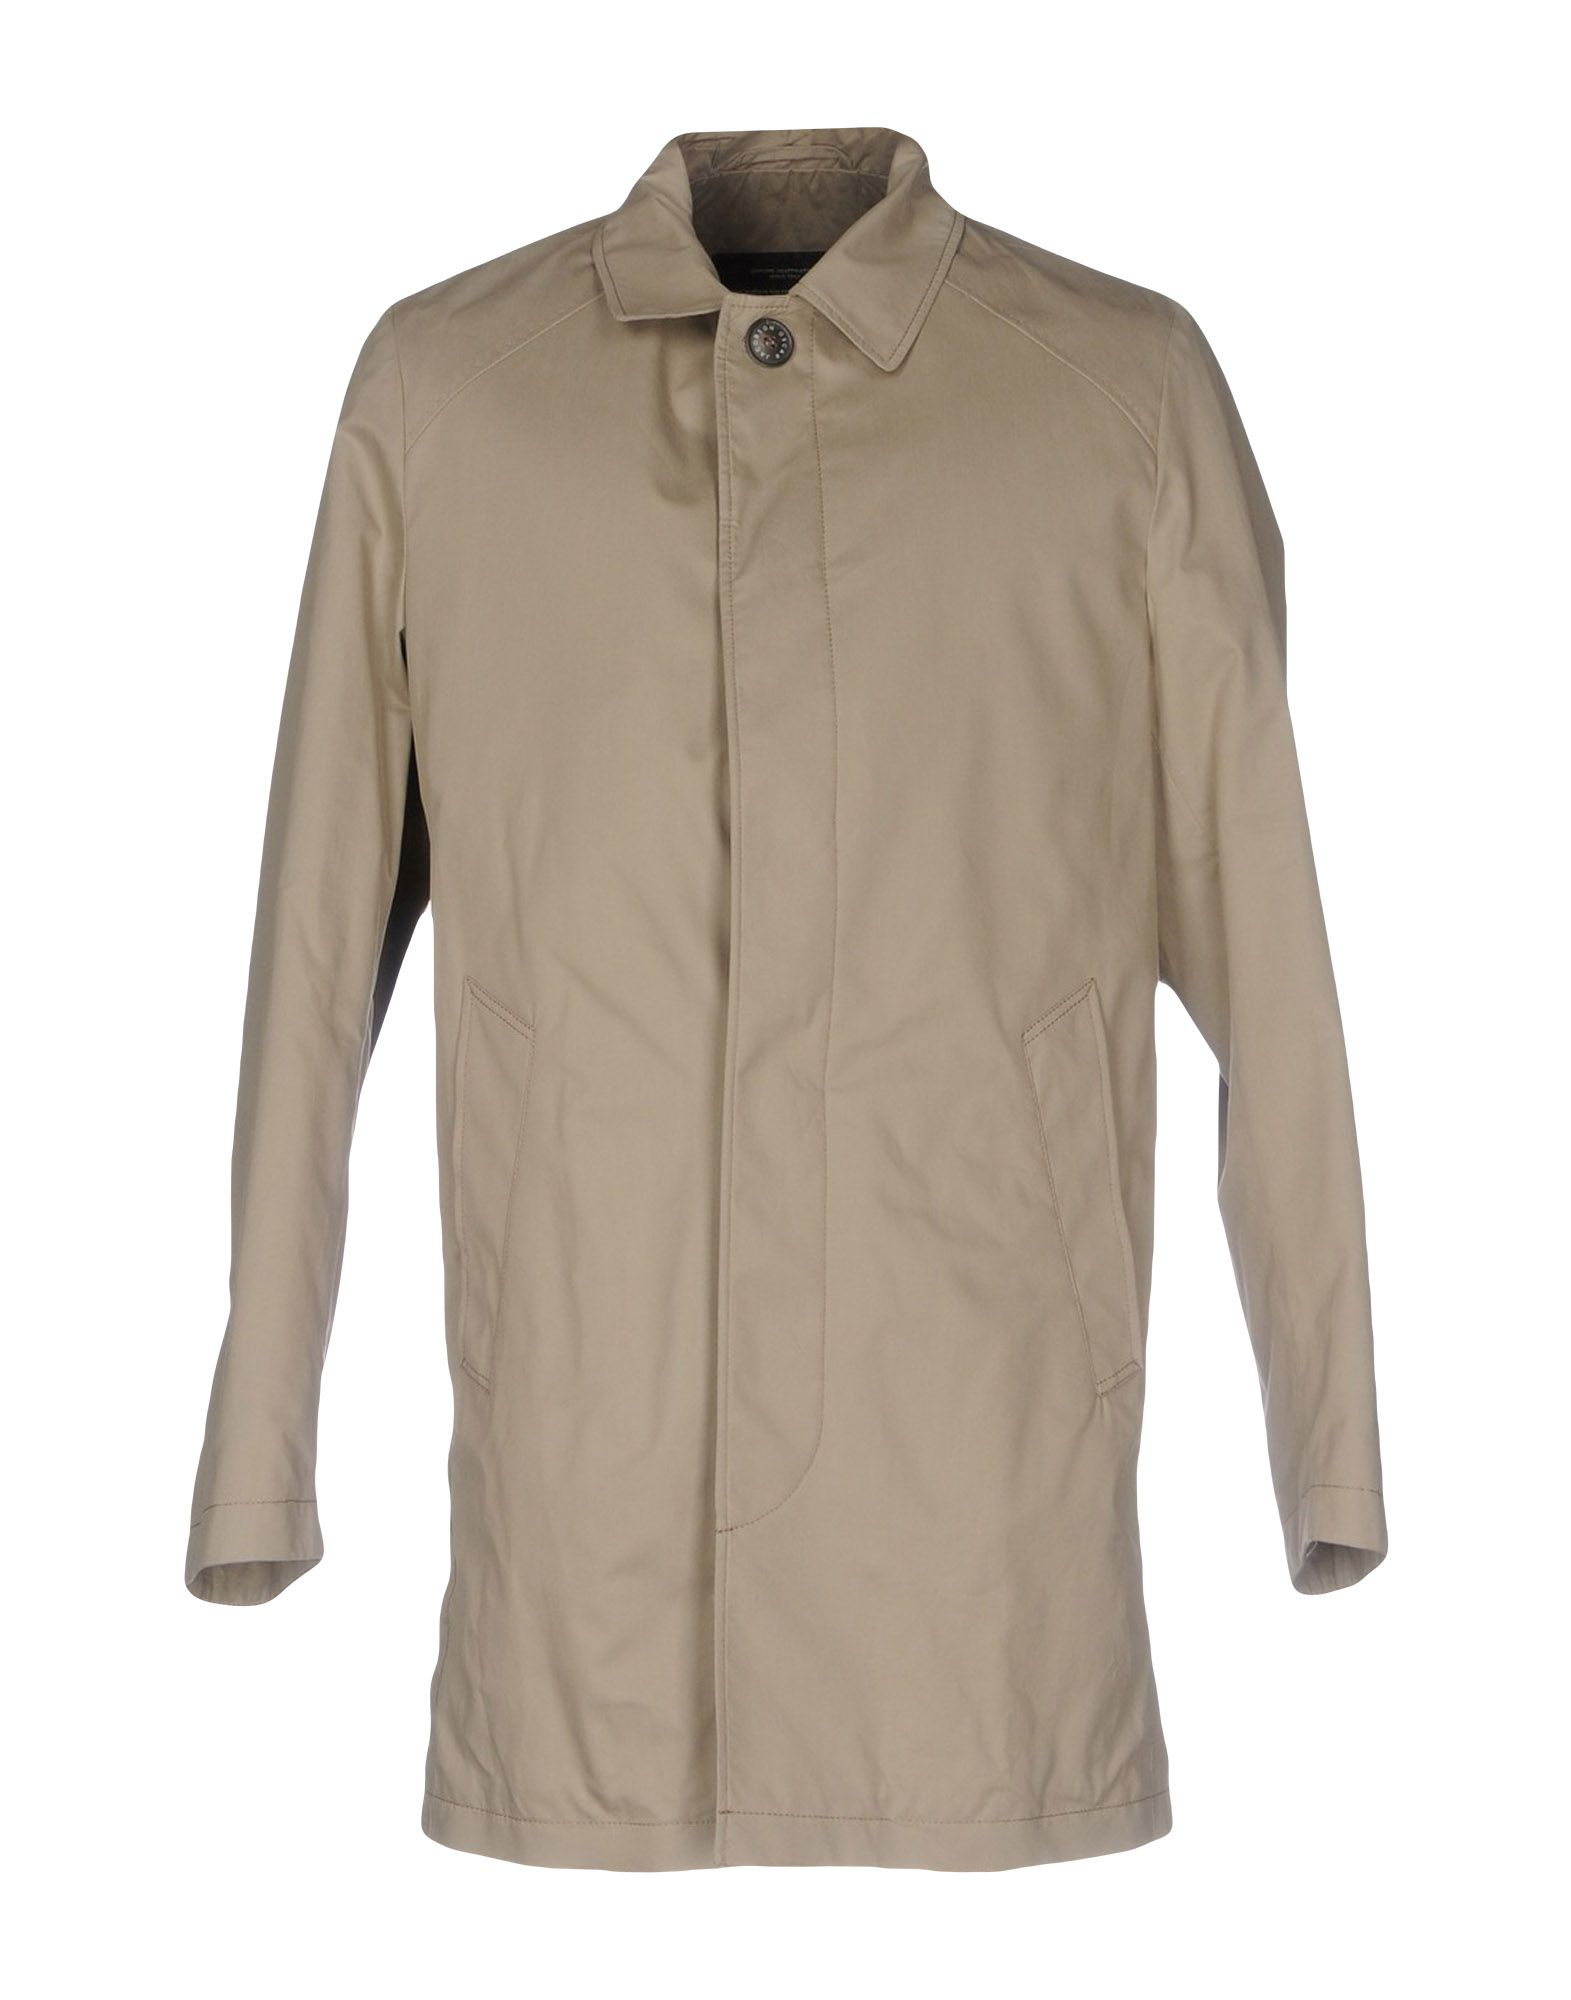 OSCAR JACOBSON Full-Length Jacket in Grey